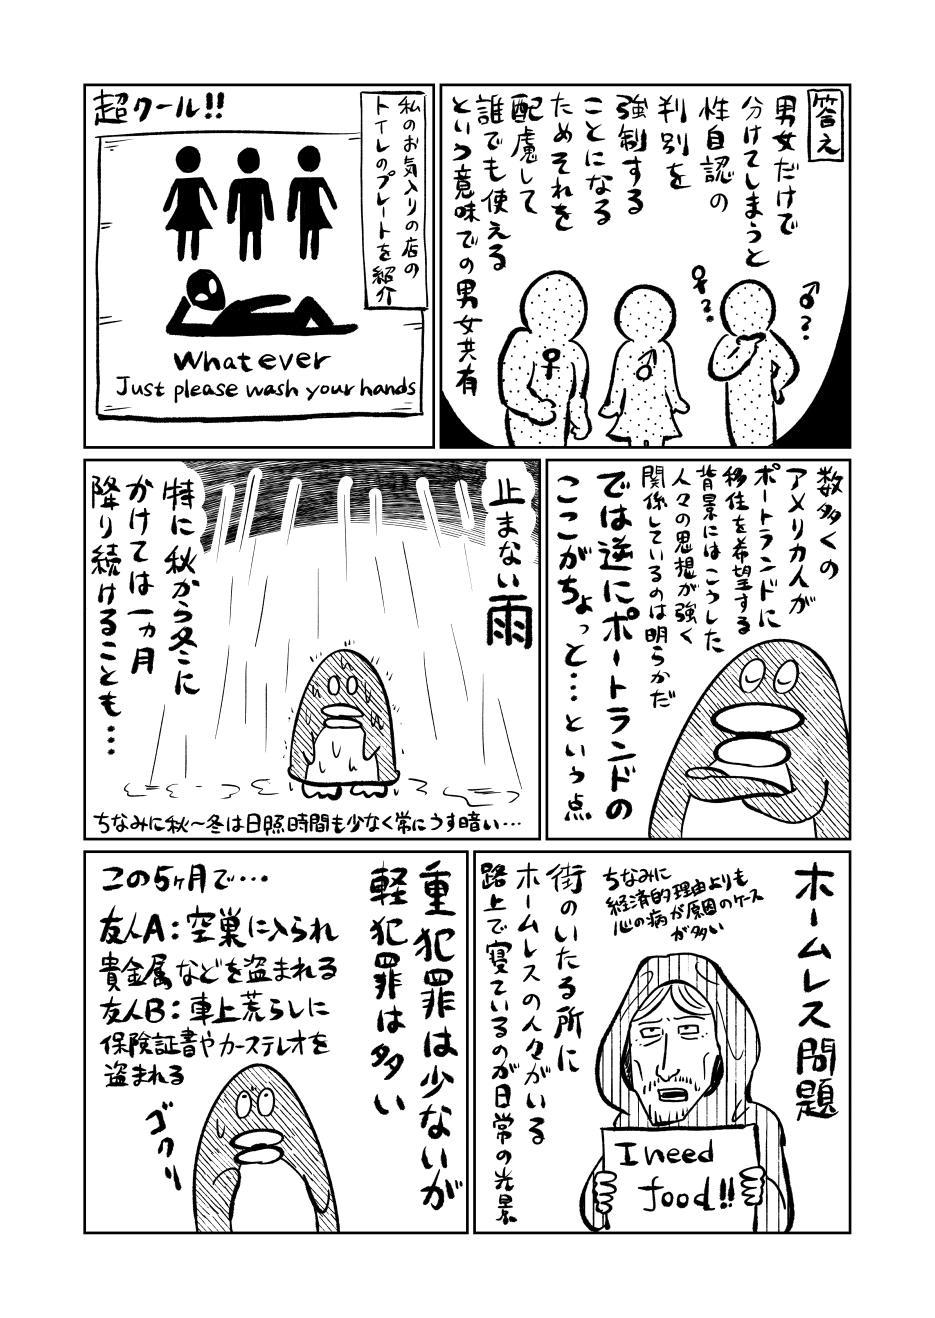 https://www.ryugaku.co.jp/blog/els_portland/upload/7bed34233ec799e9622233c99d8d6ed6b086d46b.jpg